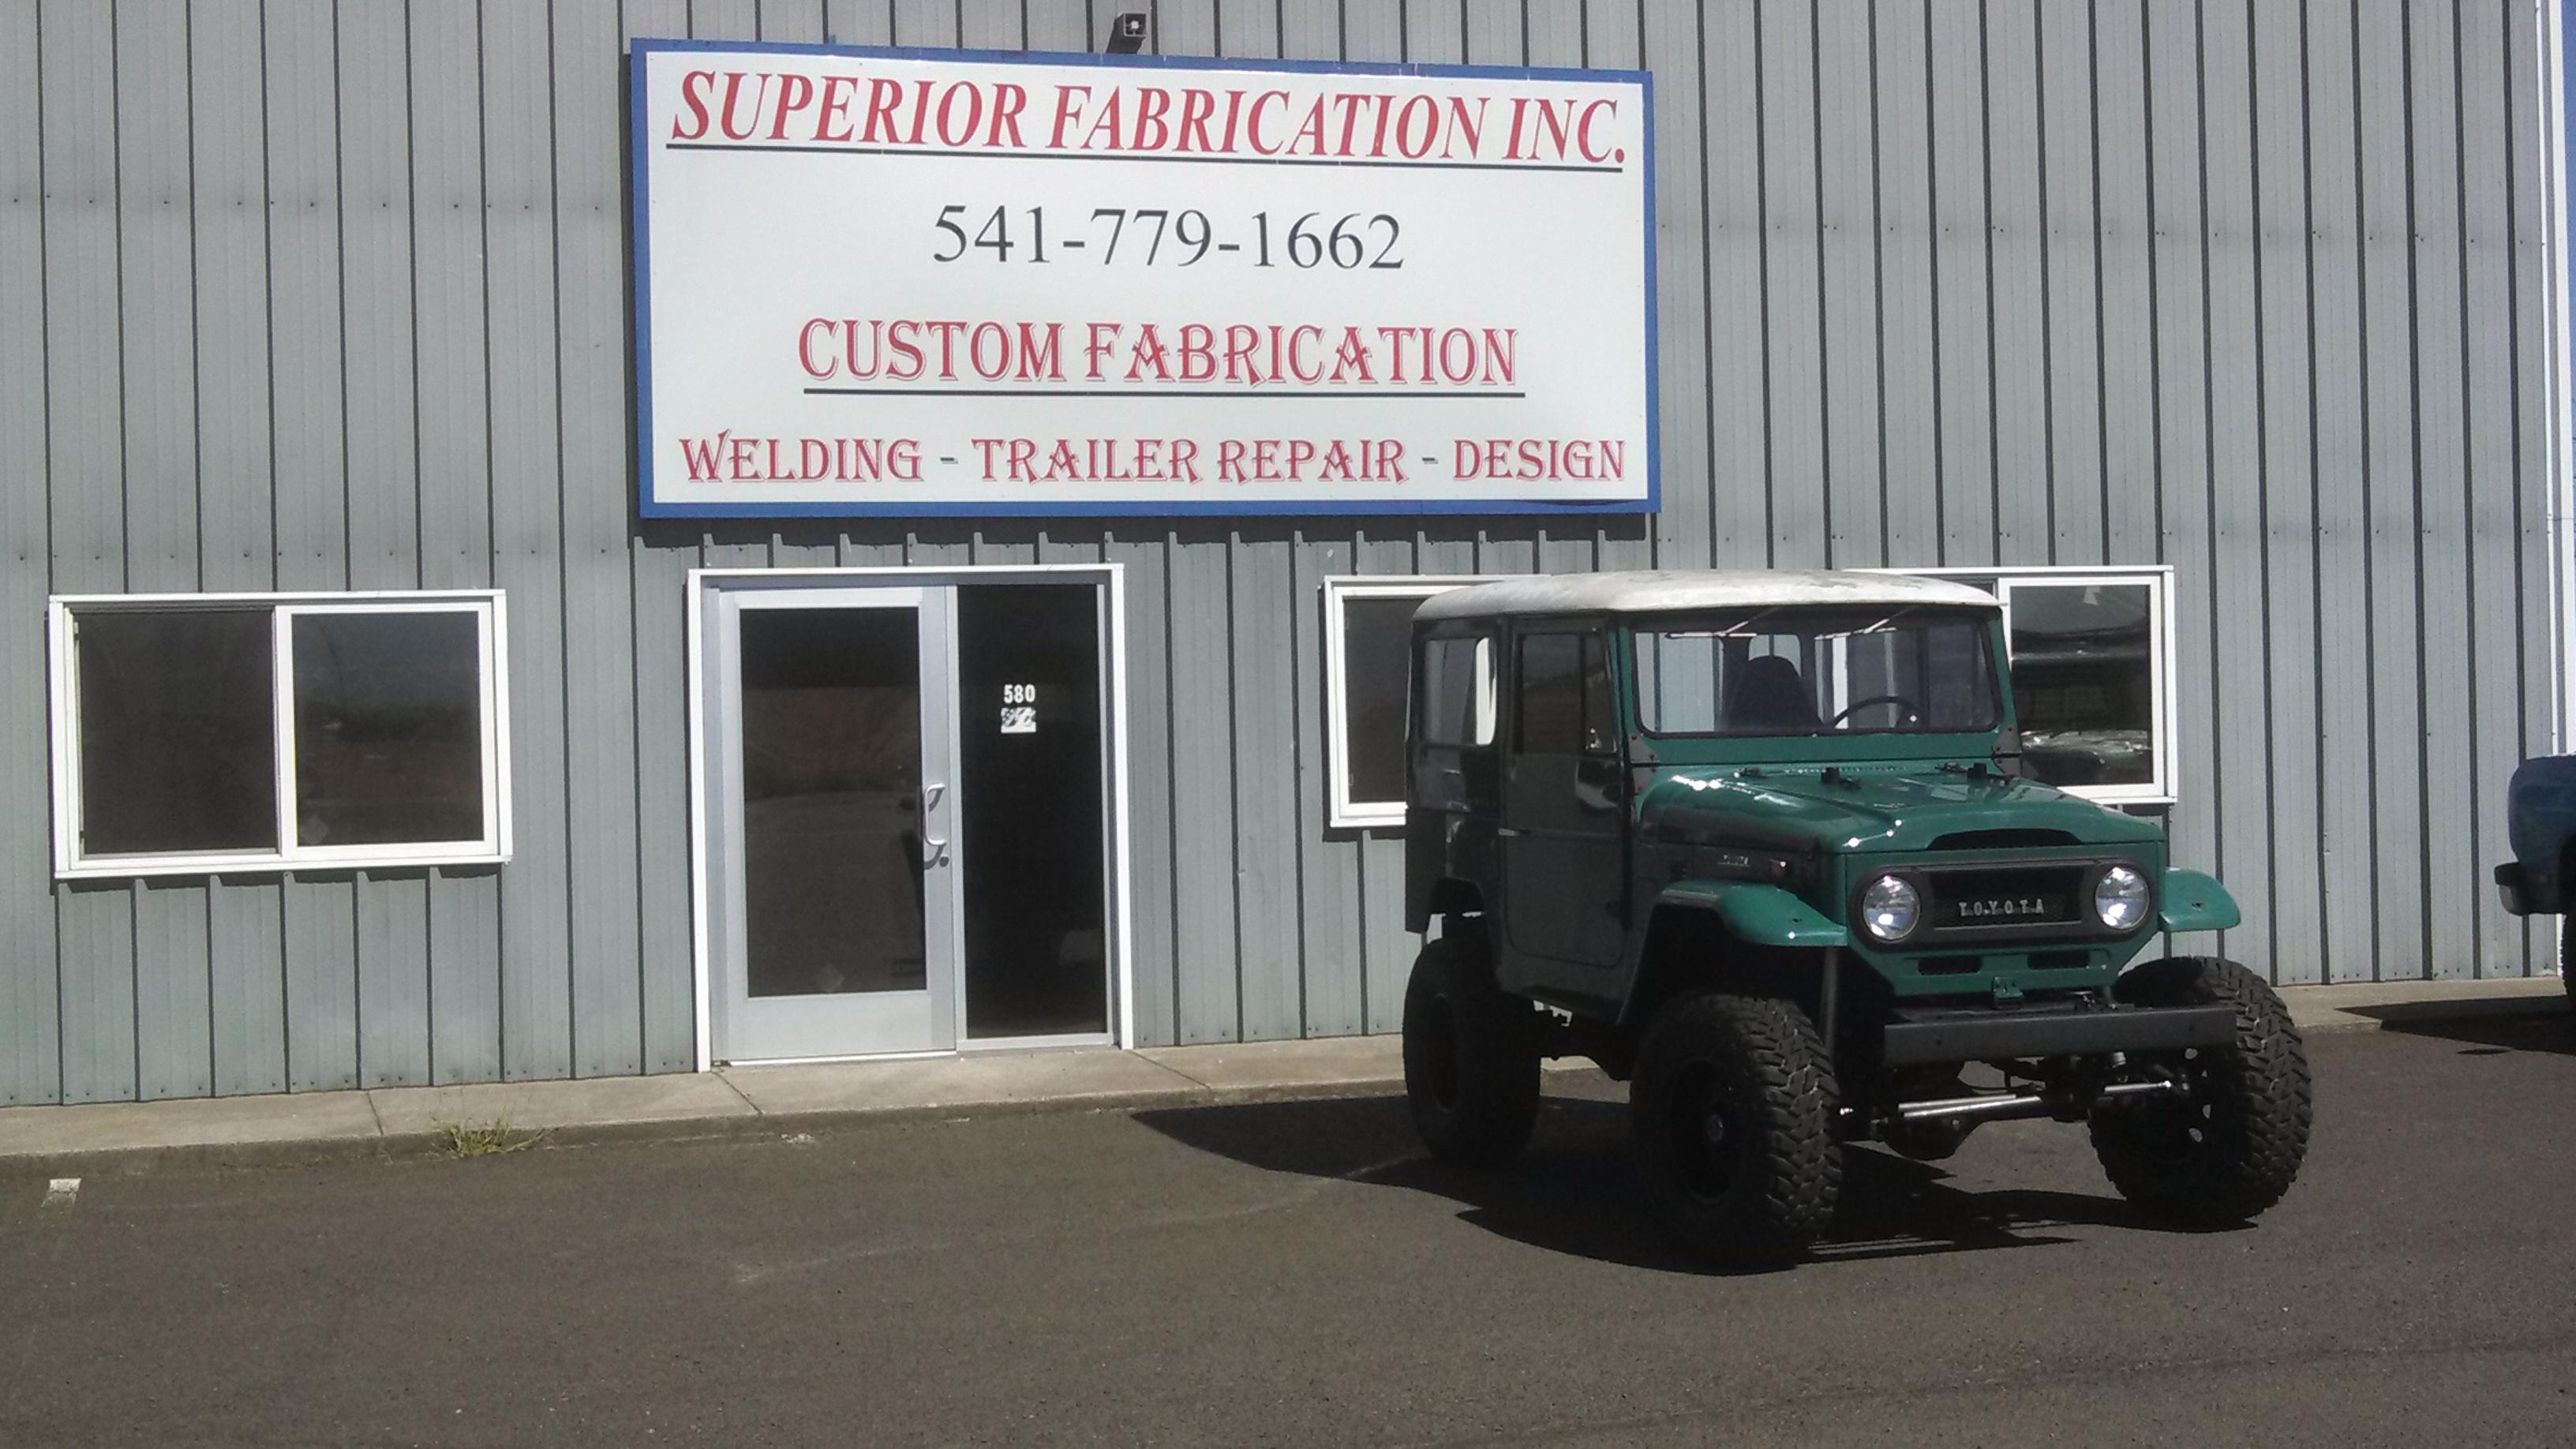 Superior Fabrication Inc - ad image